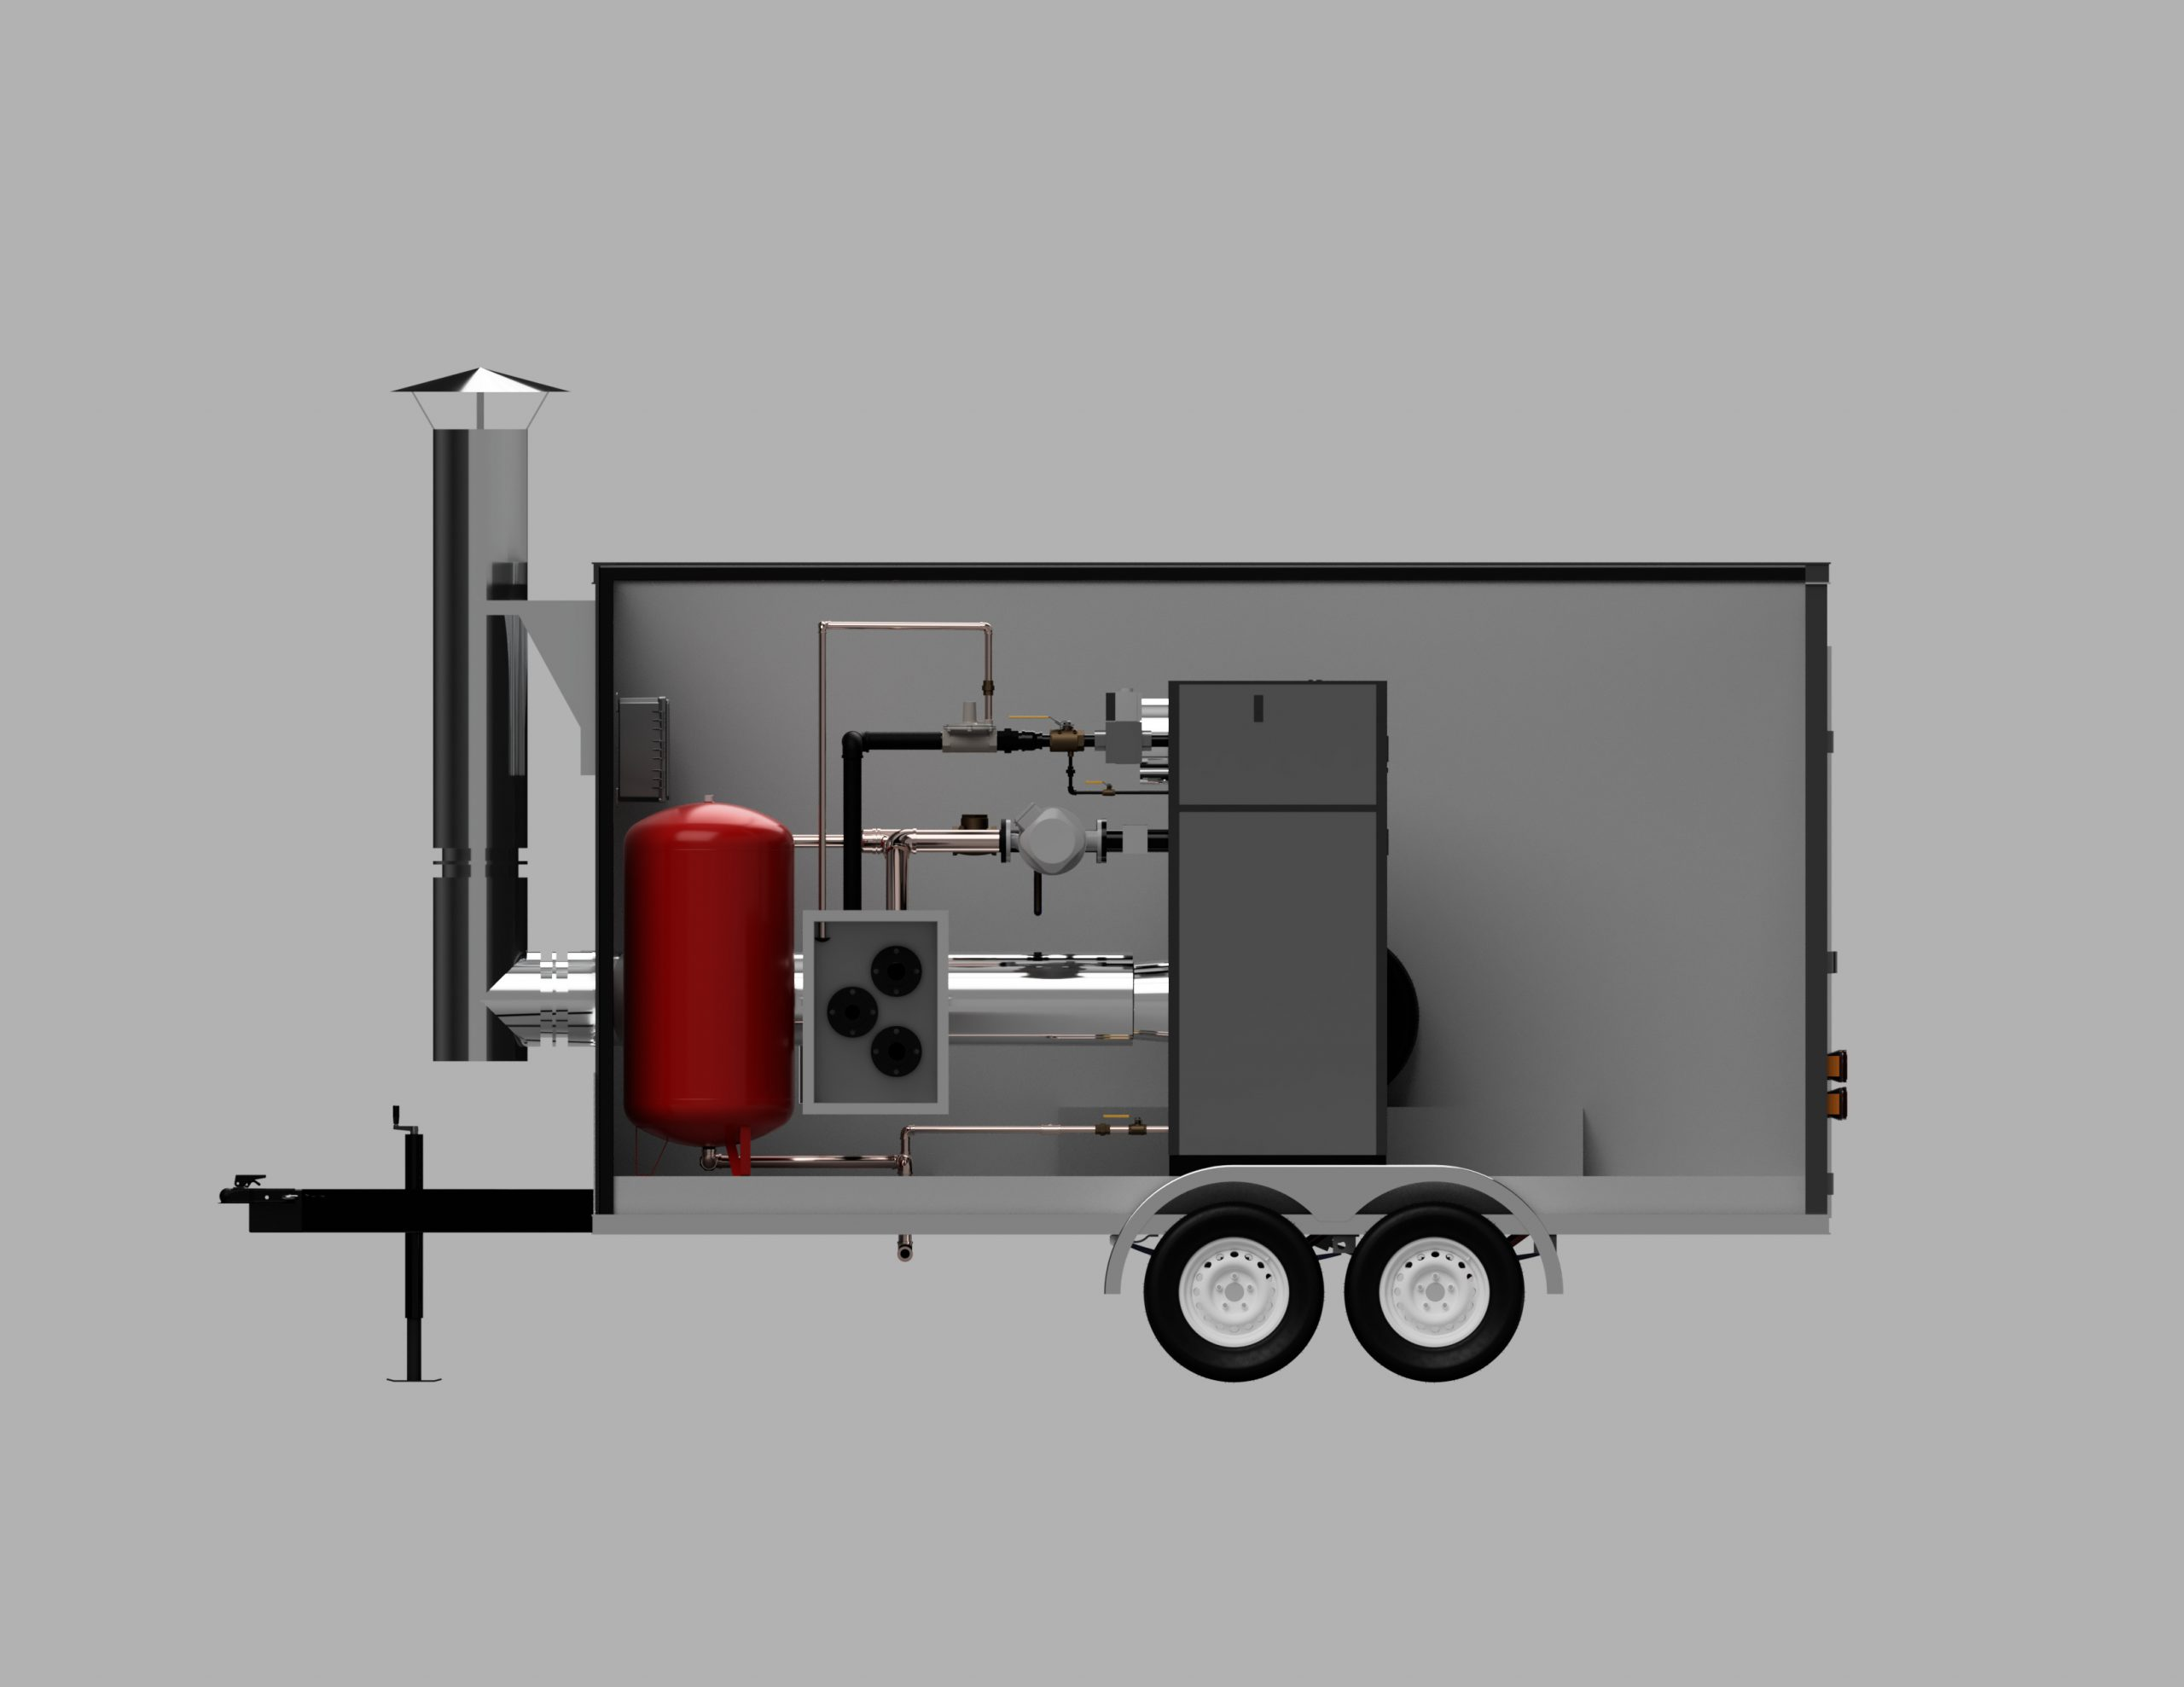 Know the steps of handling a boiler using various precautionary measures